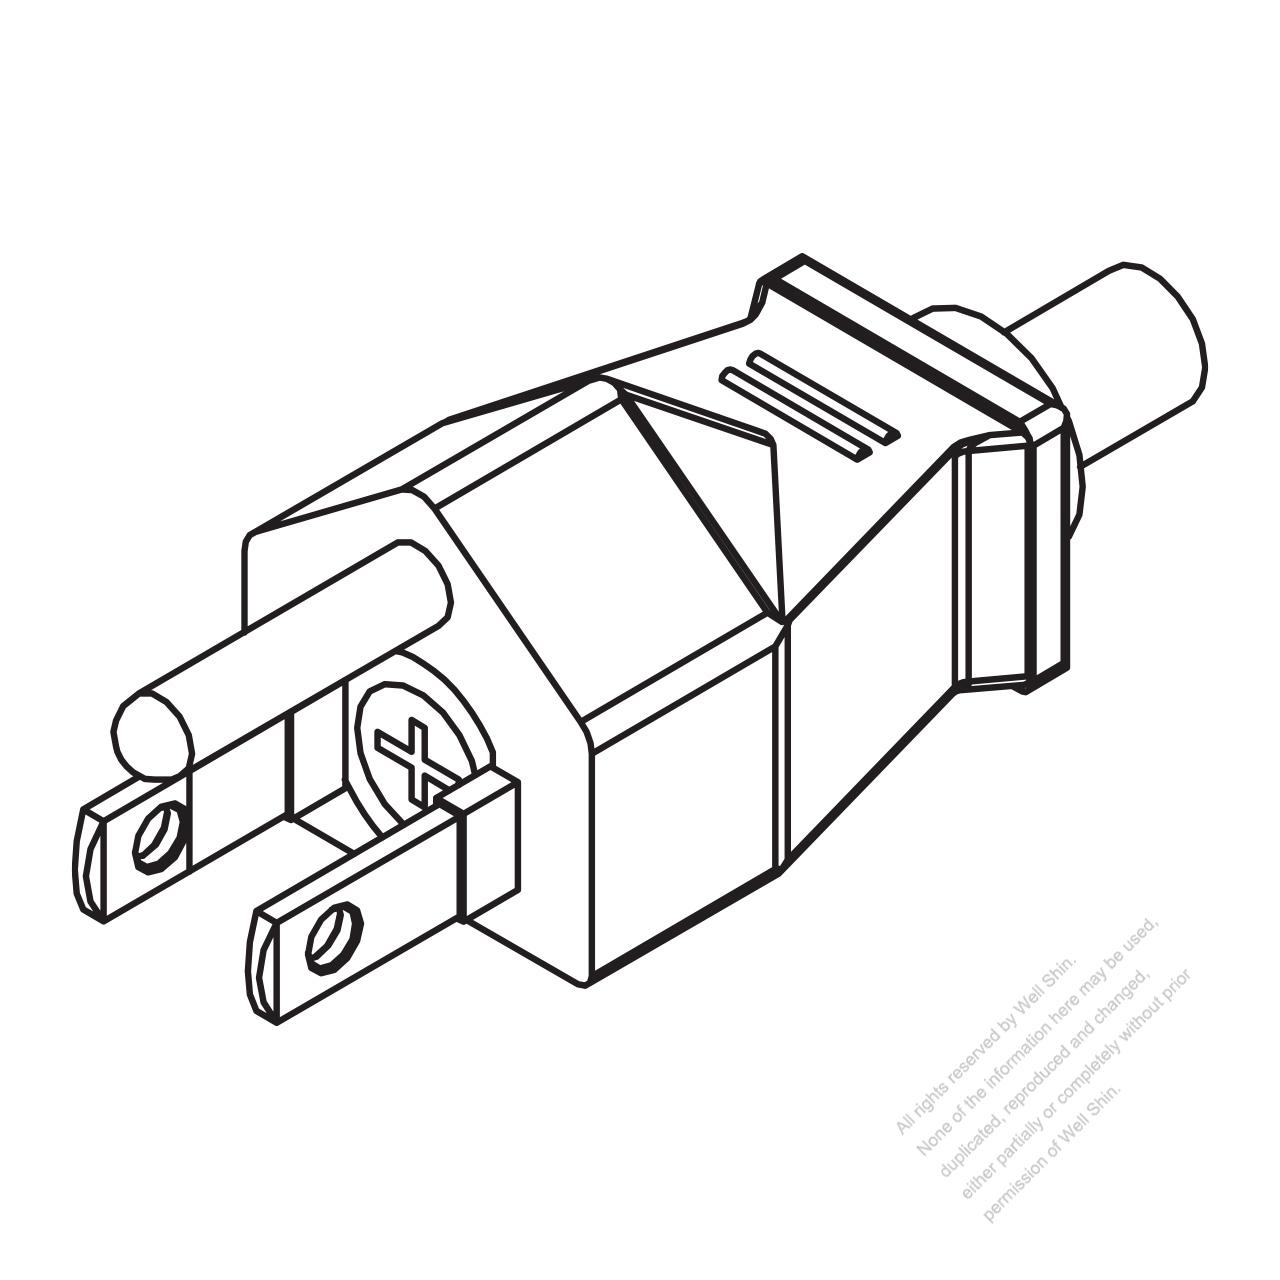 15a Fuse Box Connector